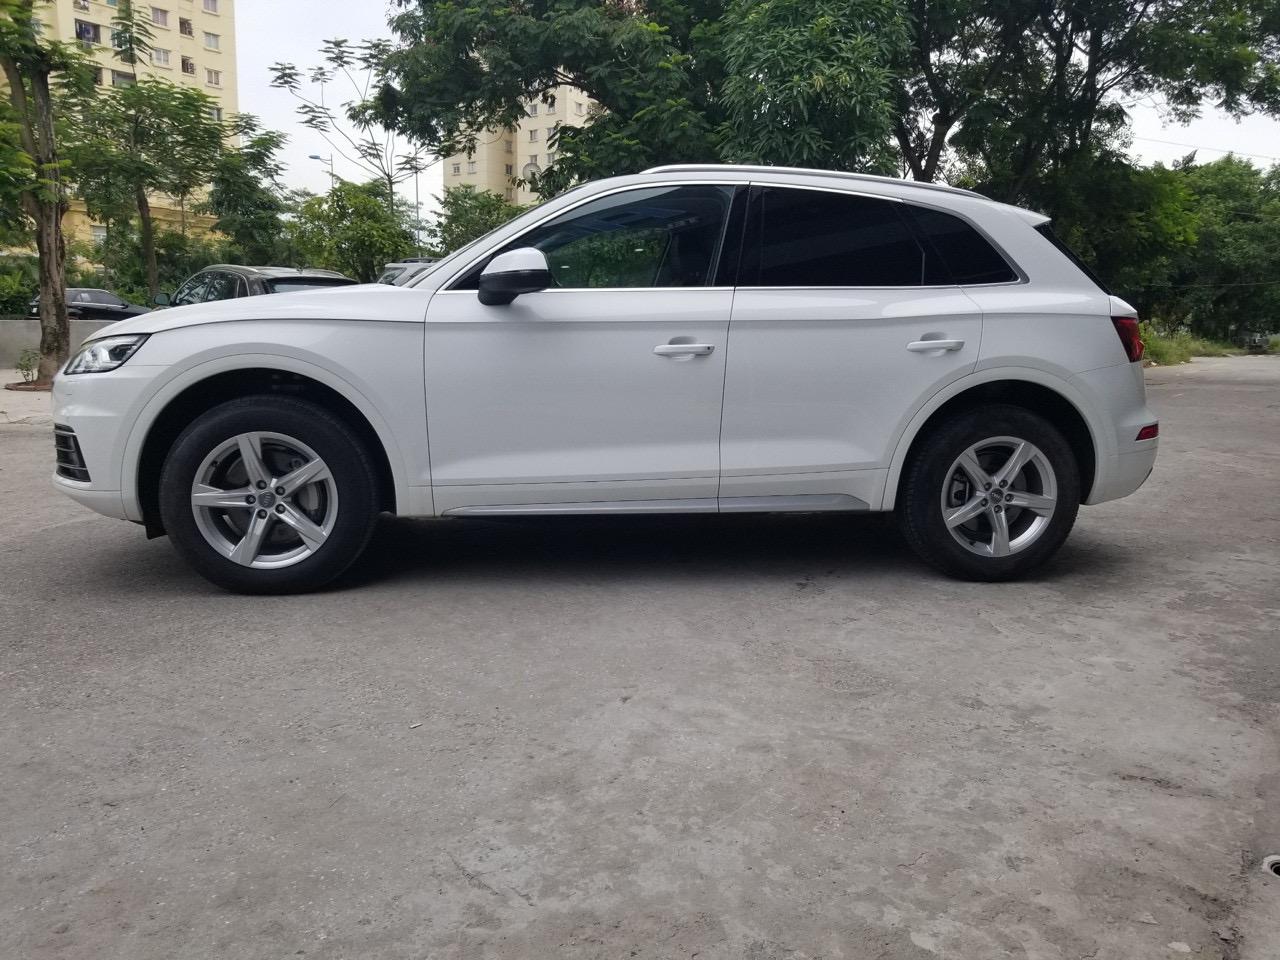 Audi Q5 2017 trắng